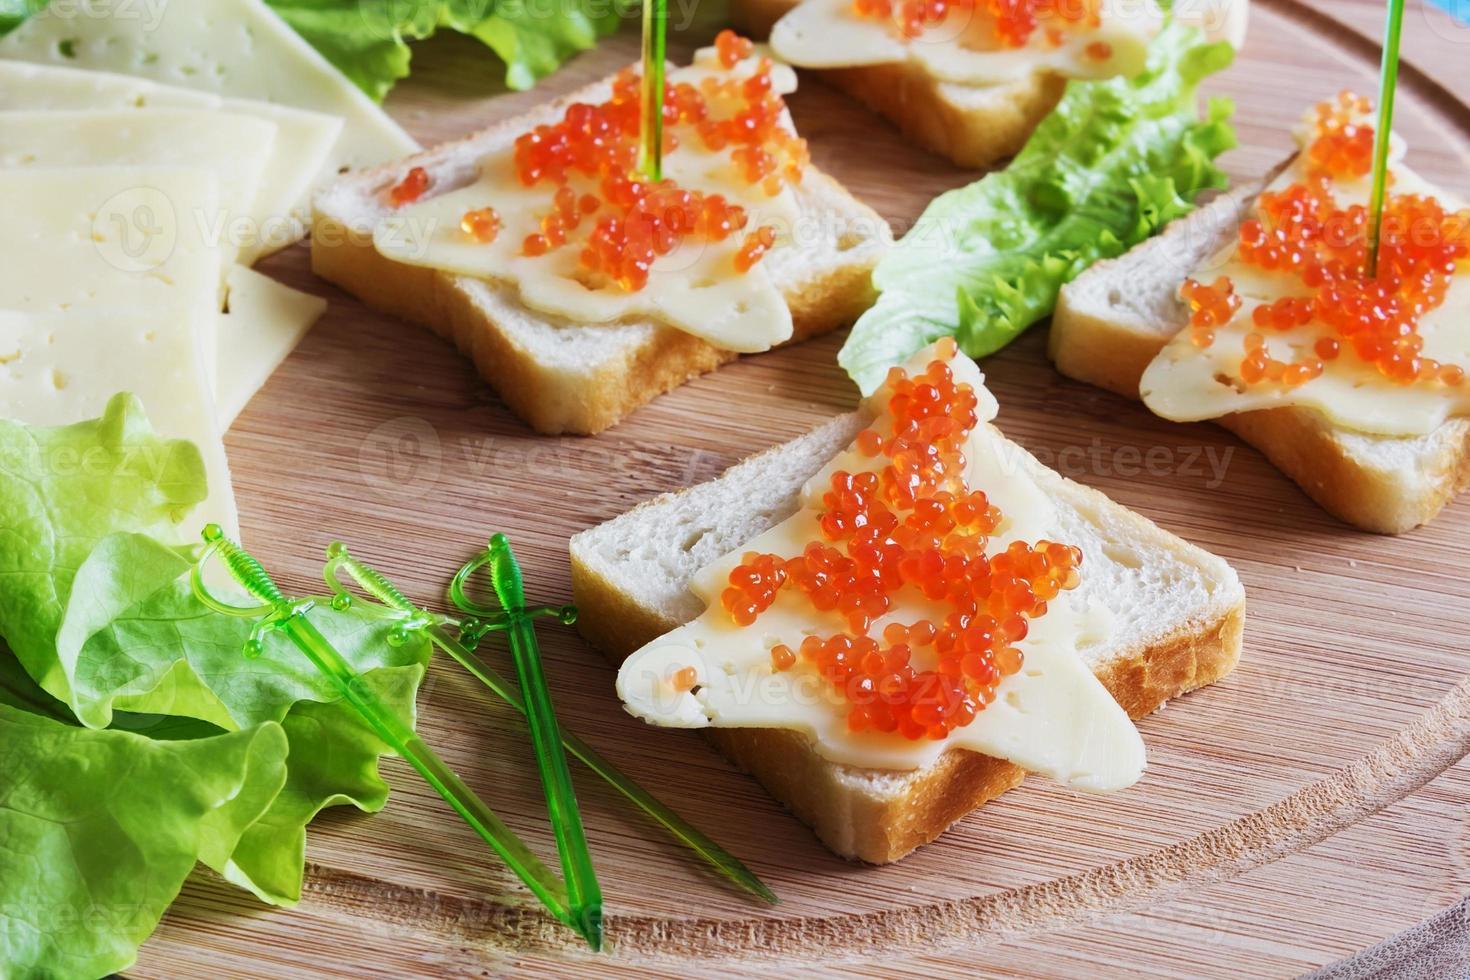 kerst sandwiches foto